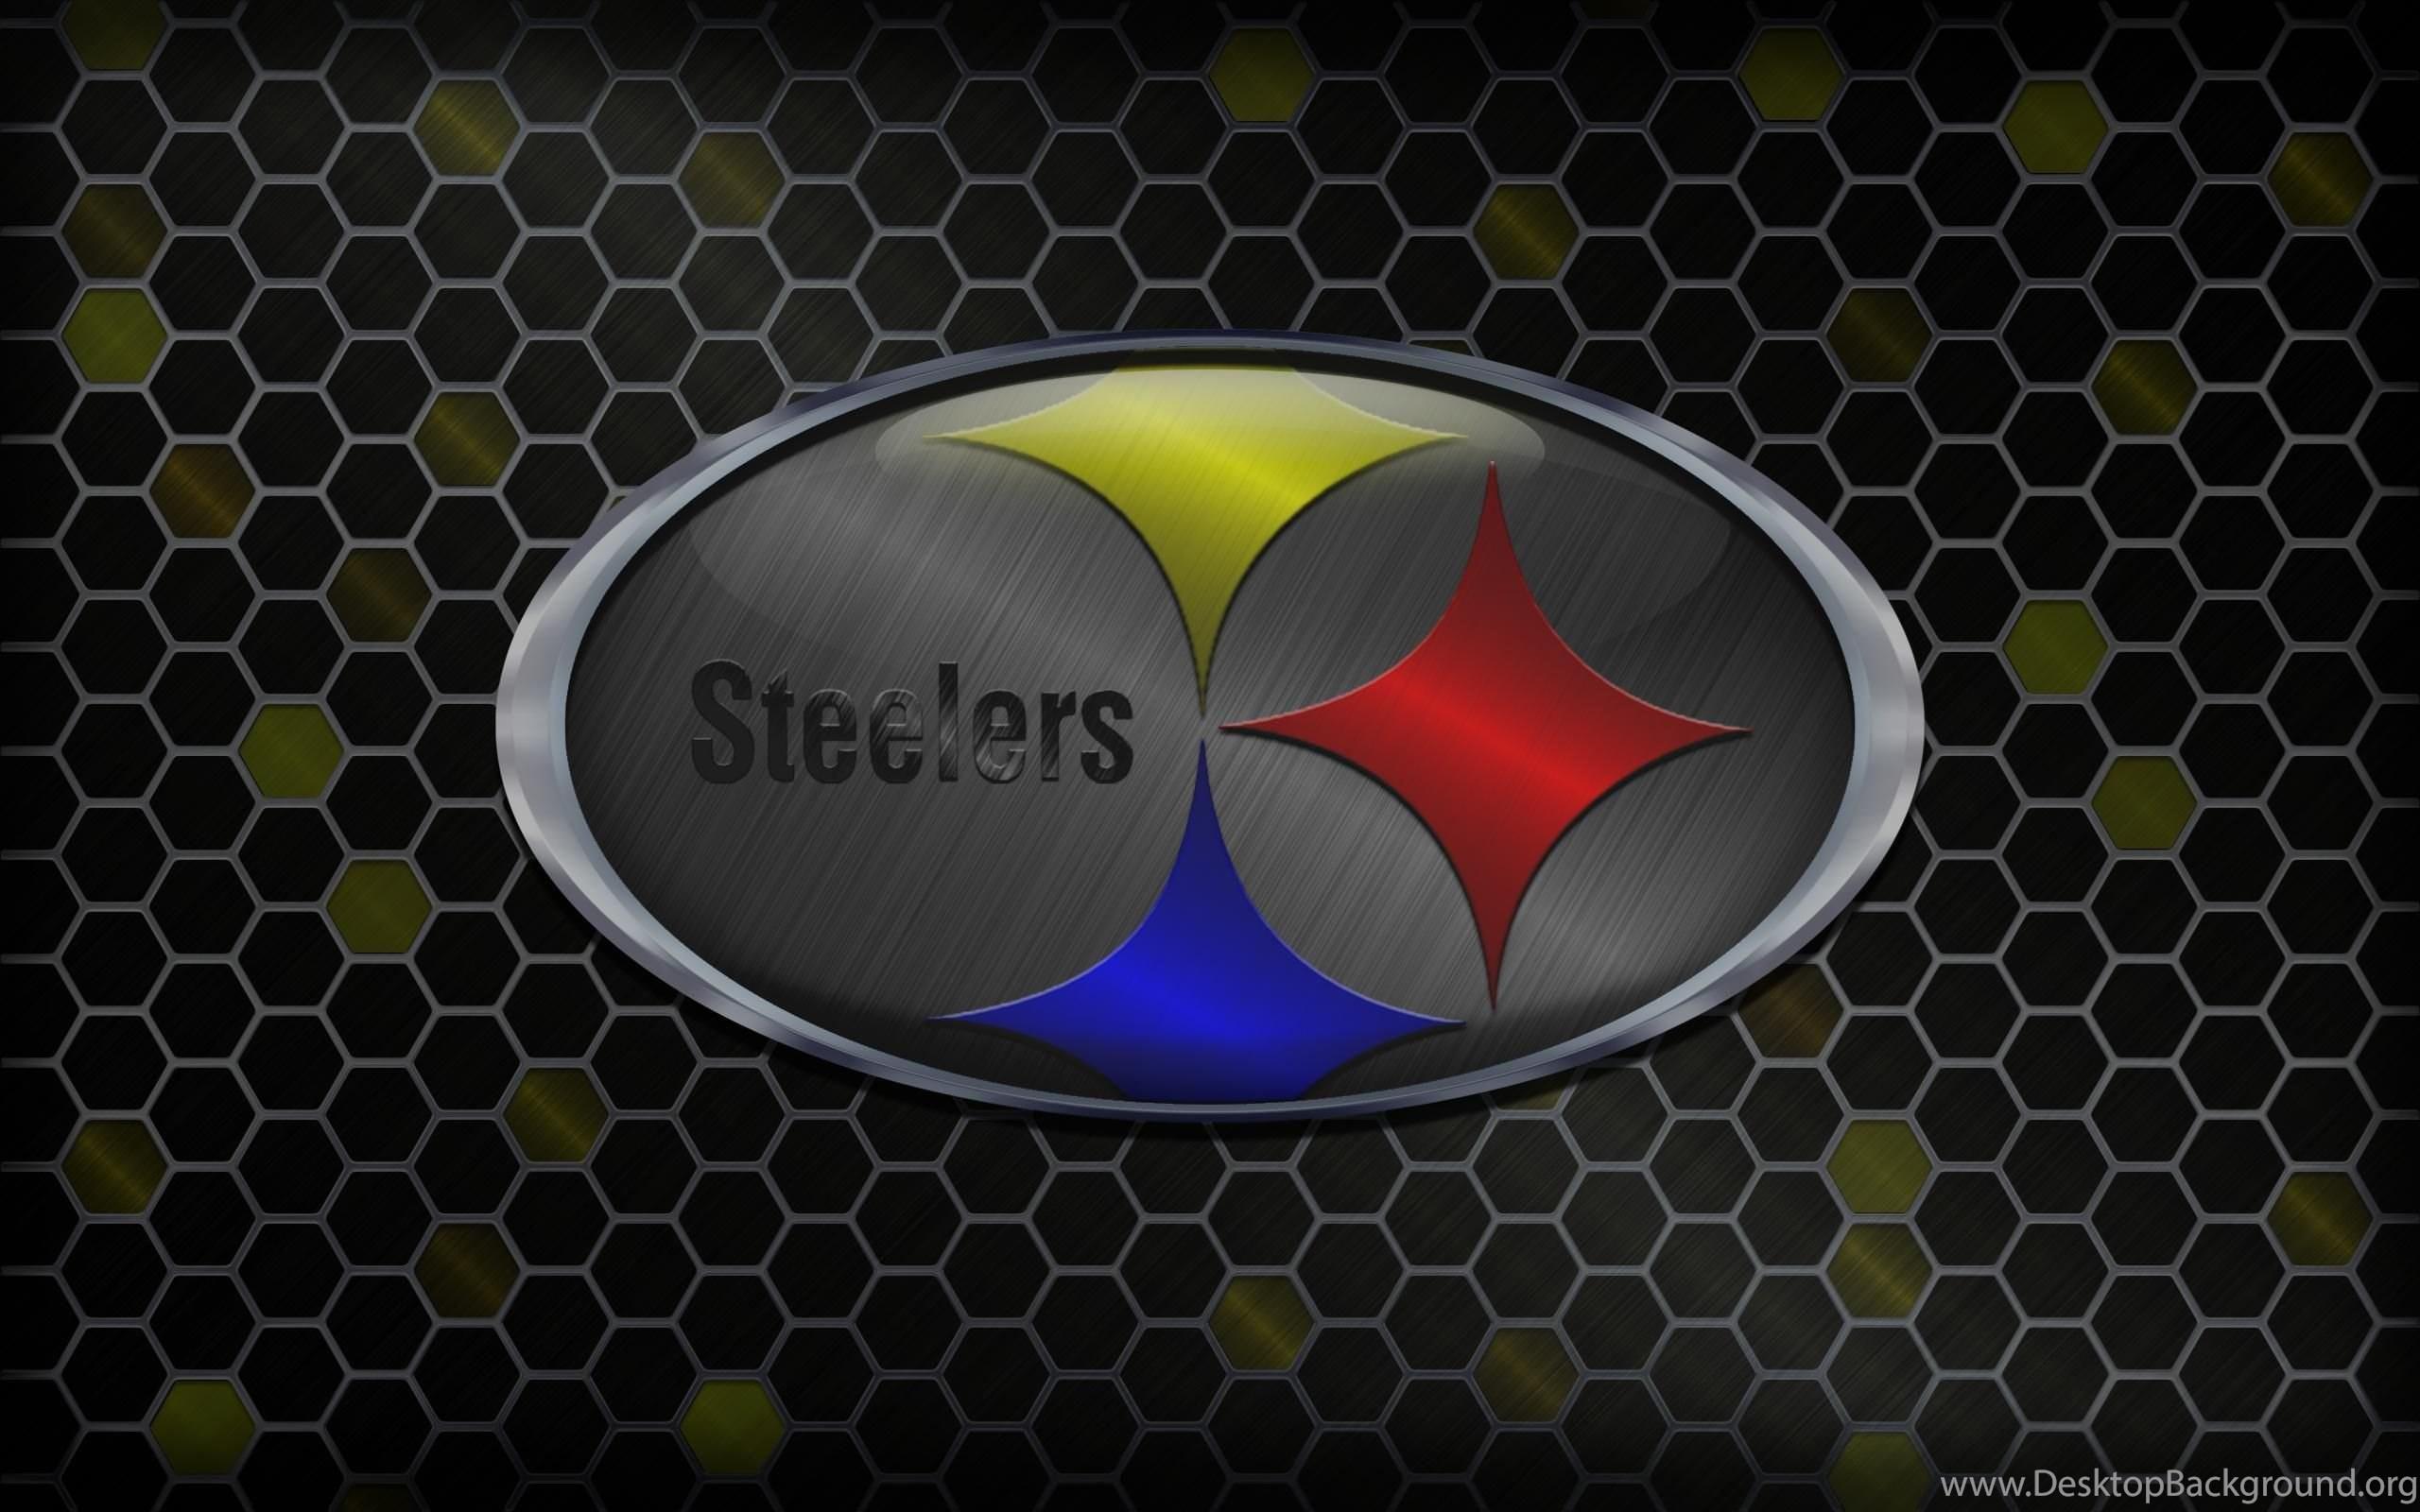 Pittsburgh steelers wallpapers hd wallpapers pittsburgh steelers original size 3913kb voltagebd Images